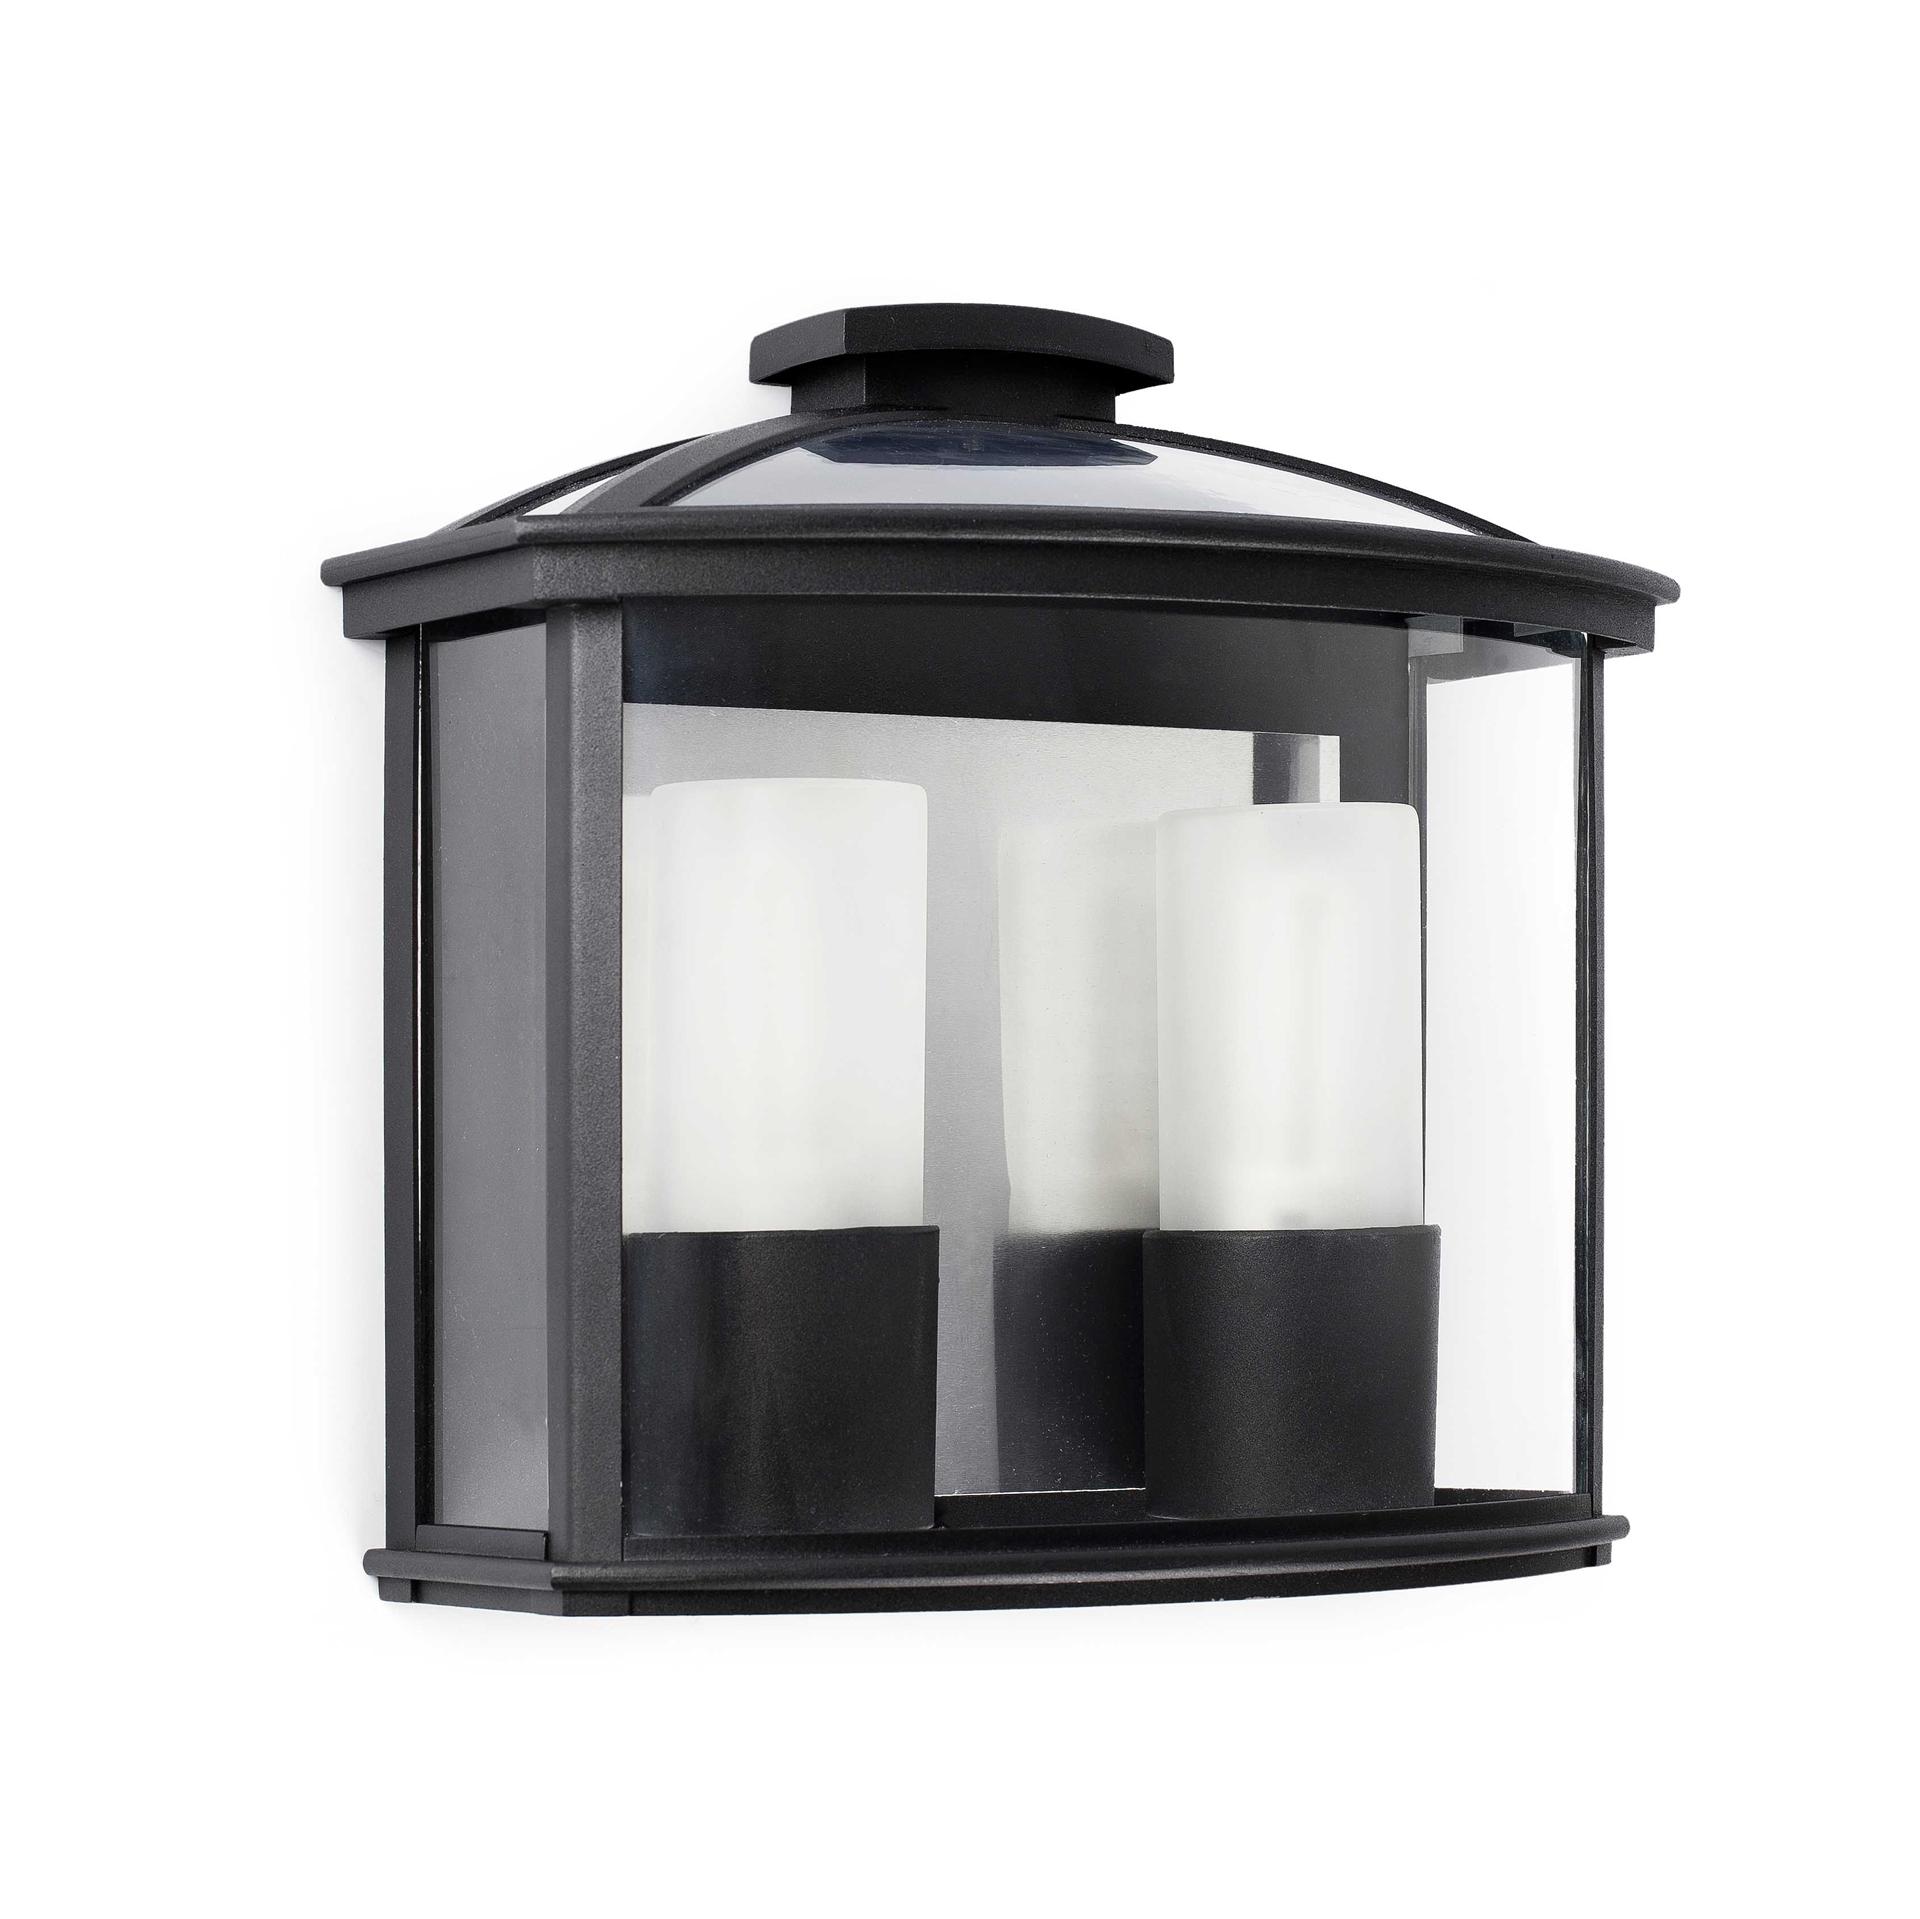 Faro Ceres 2 Black Lantern For Outdoor Modern Wall Light 71608